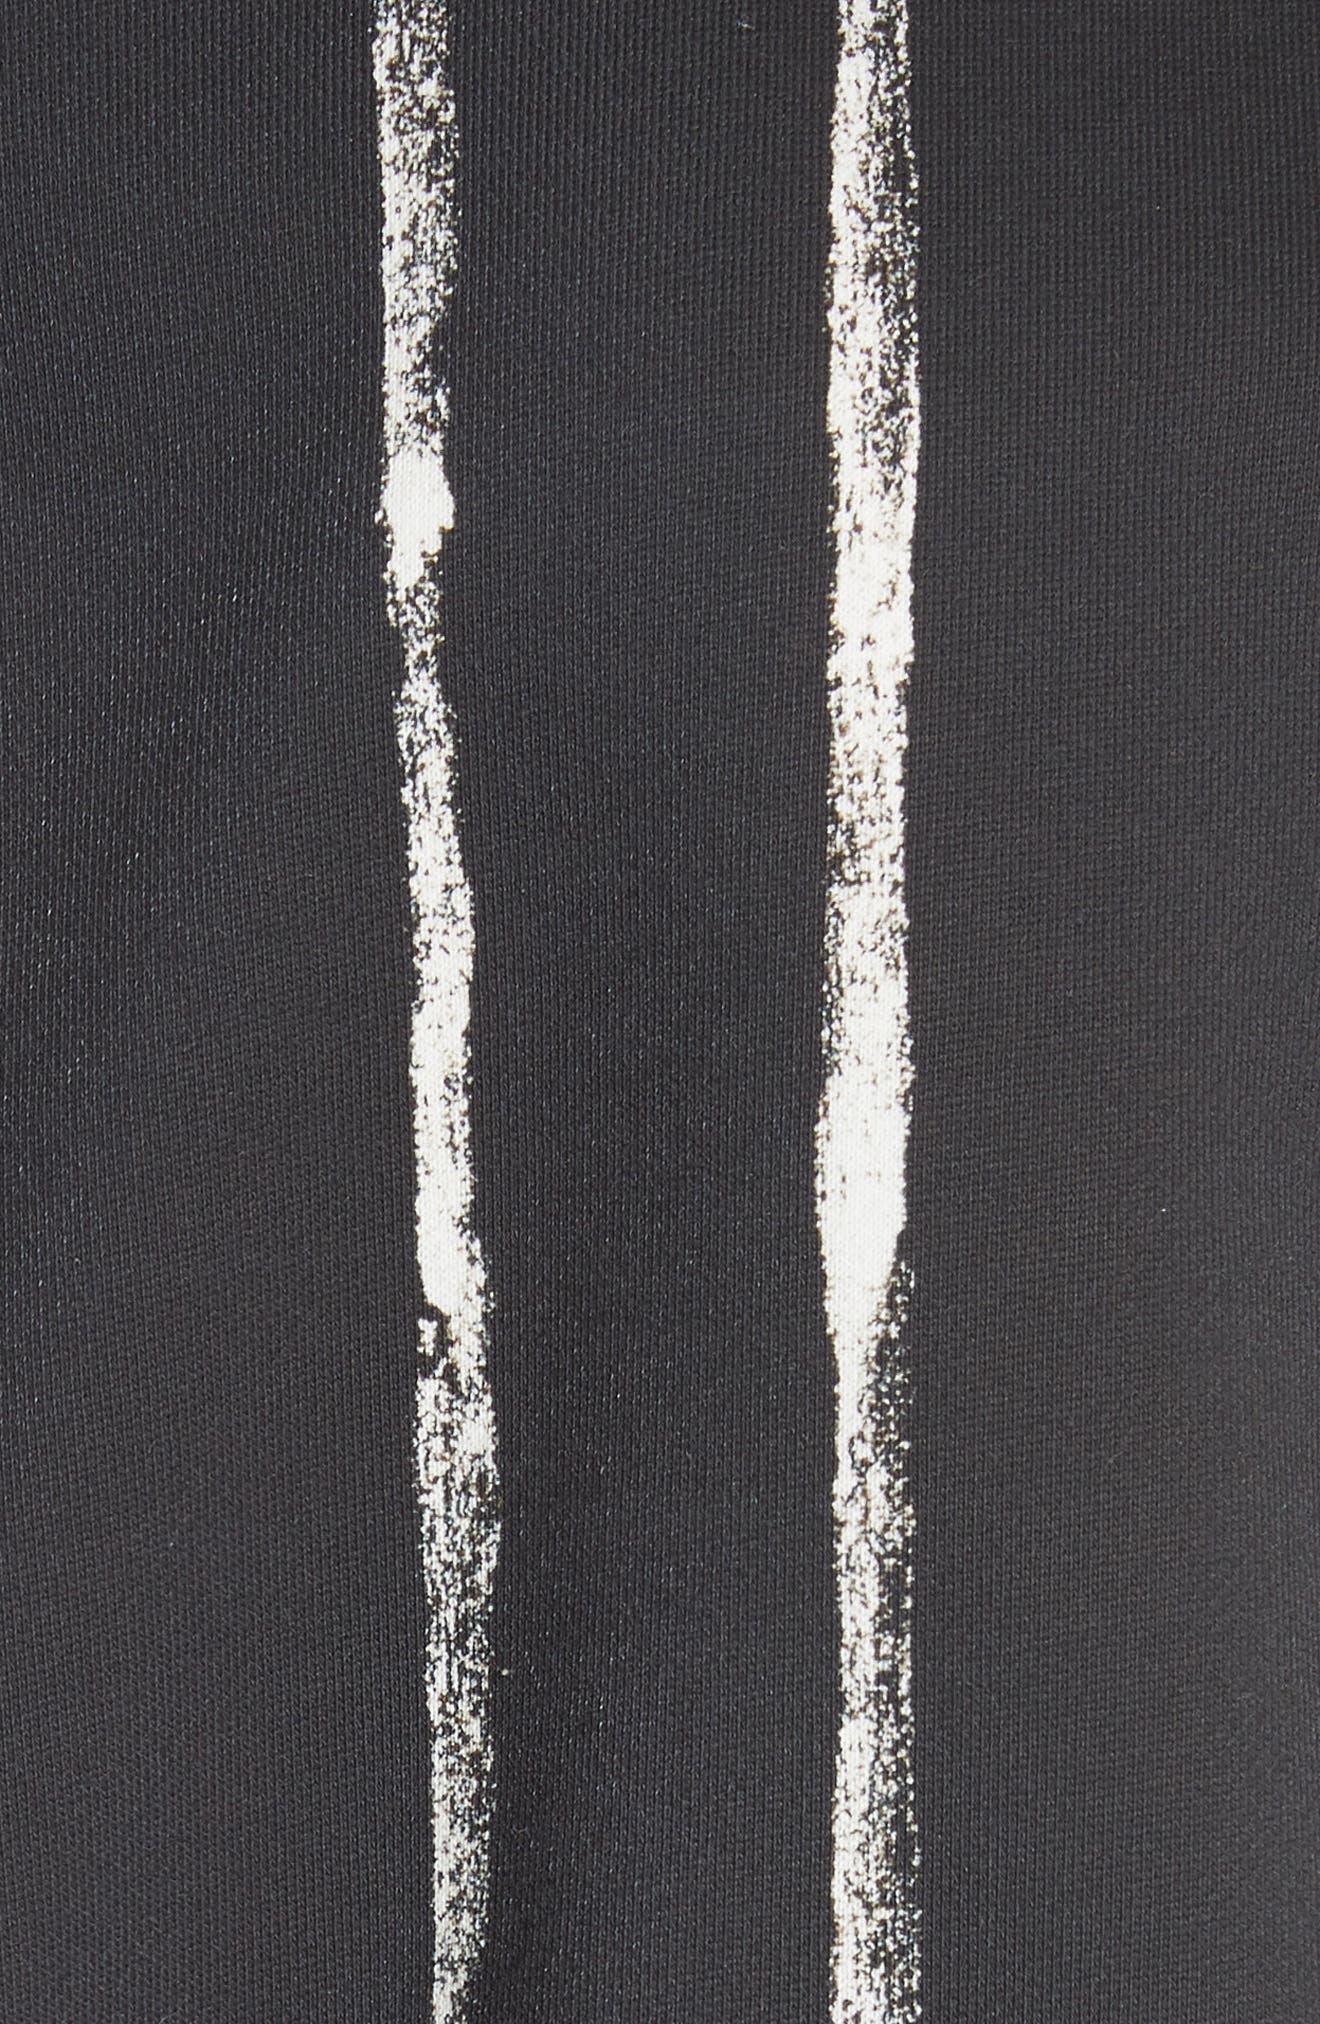 Paint Stripe Crewneck Sweatshirt,                             Alternate thumbnail 5, color,                             Black/ White